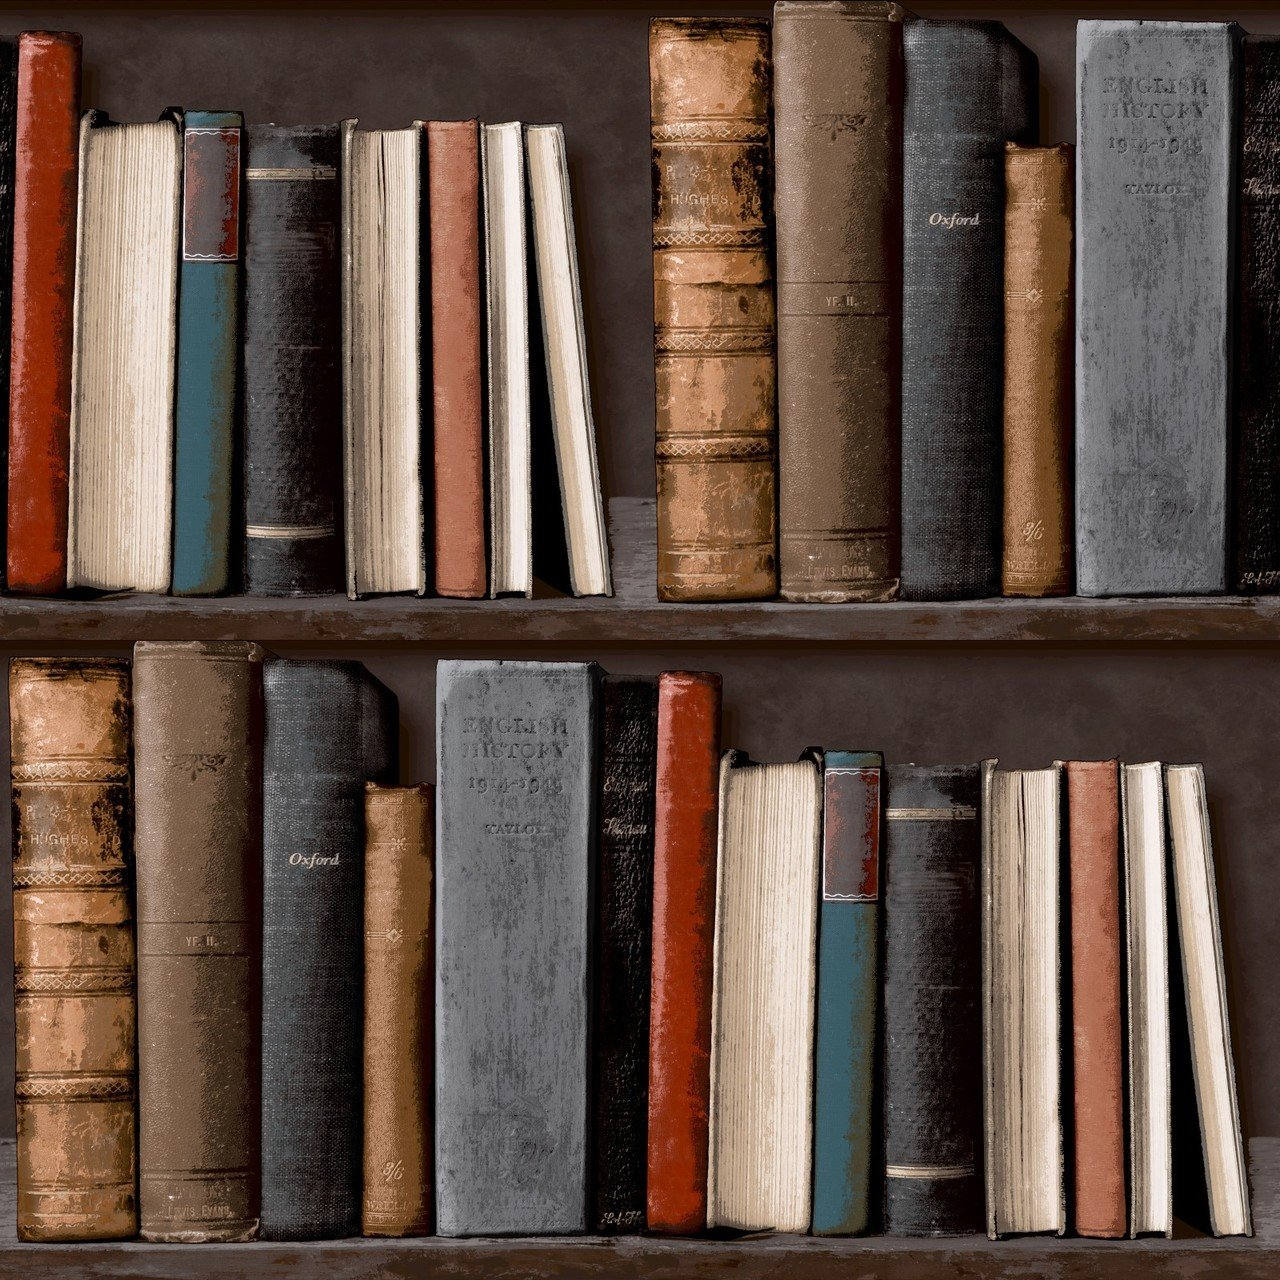 library bookshelf wallpaper  02339139723024012801280 1280x1280